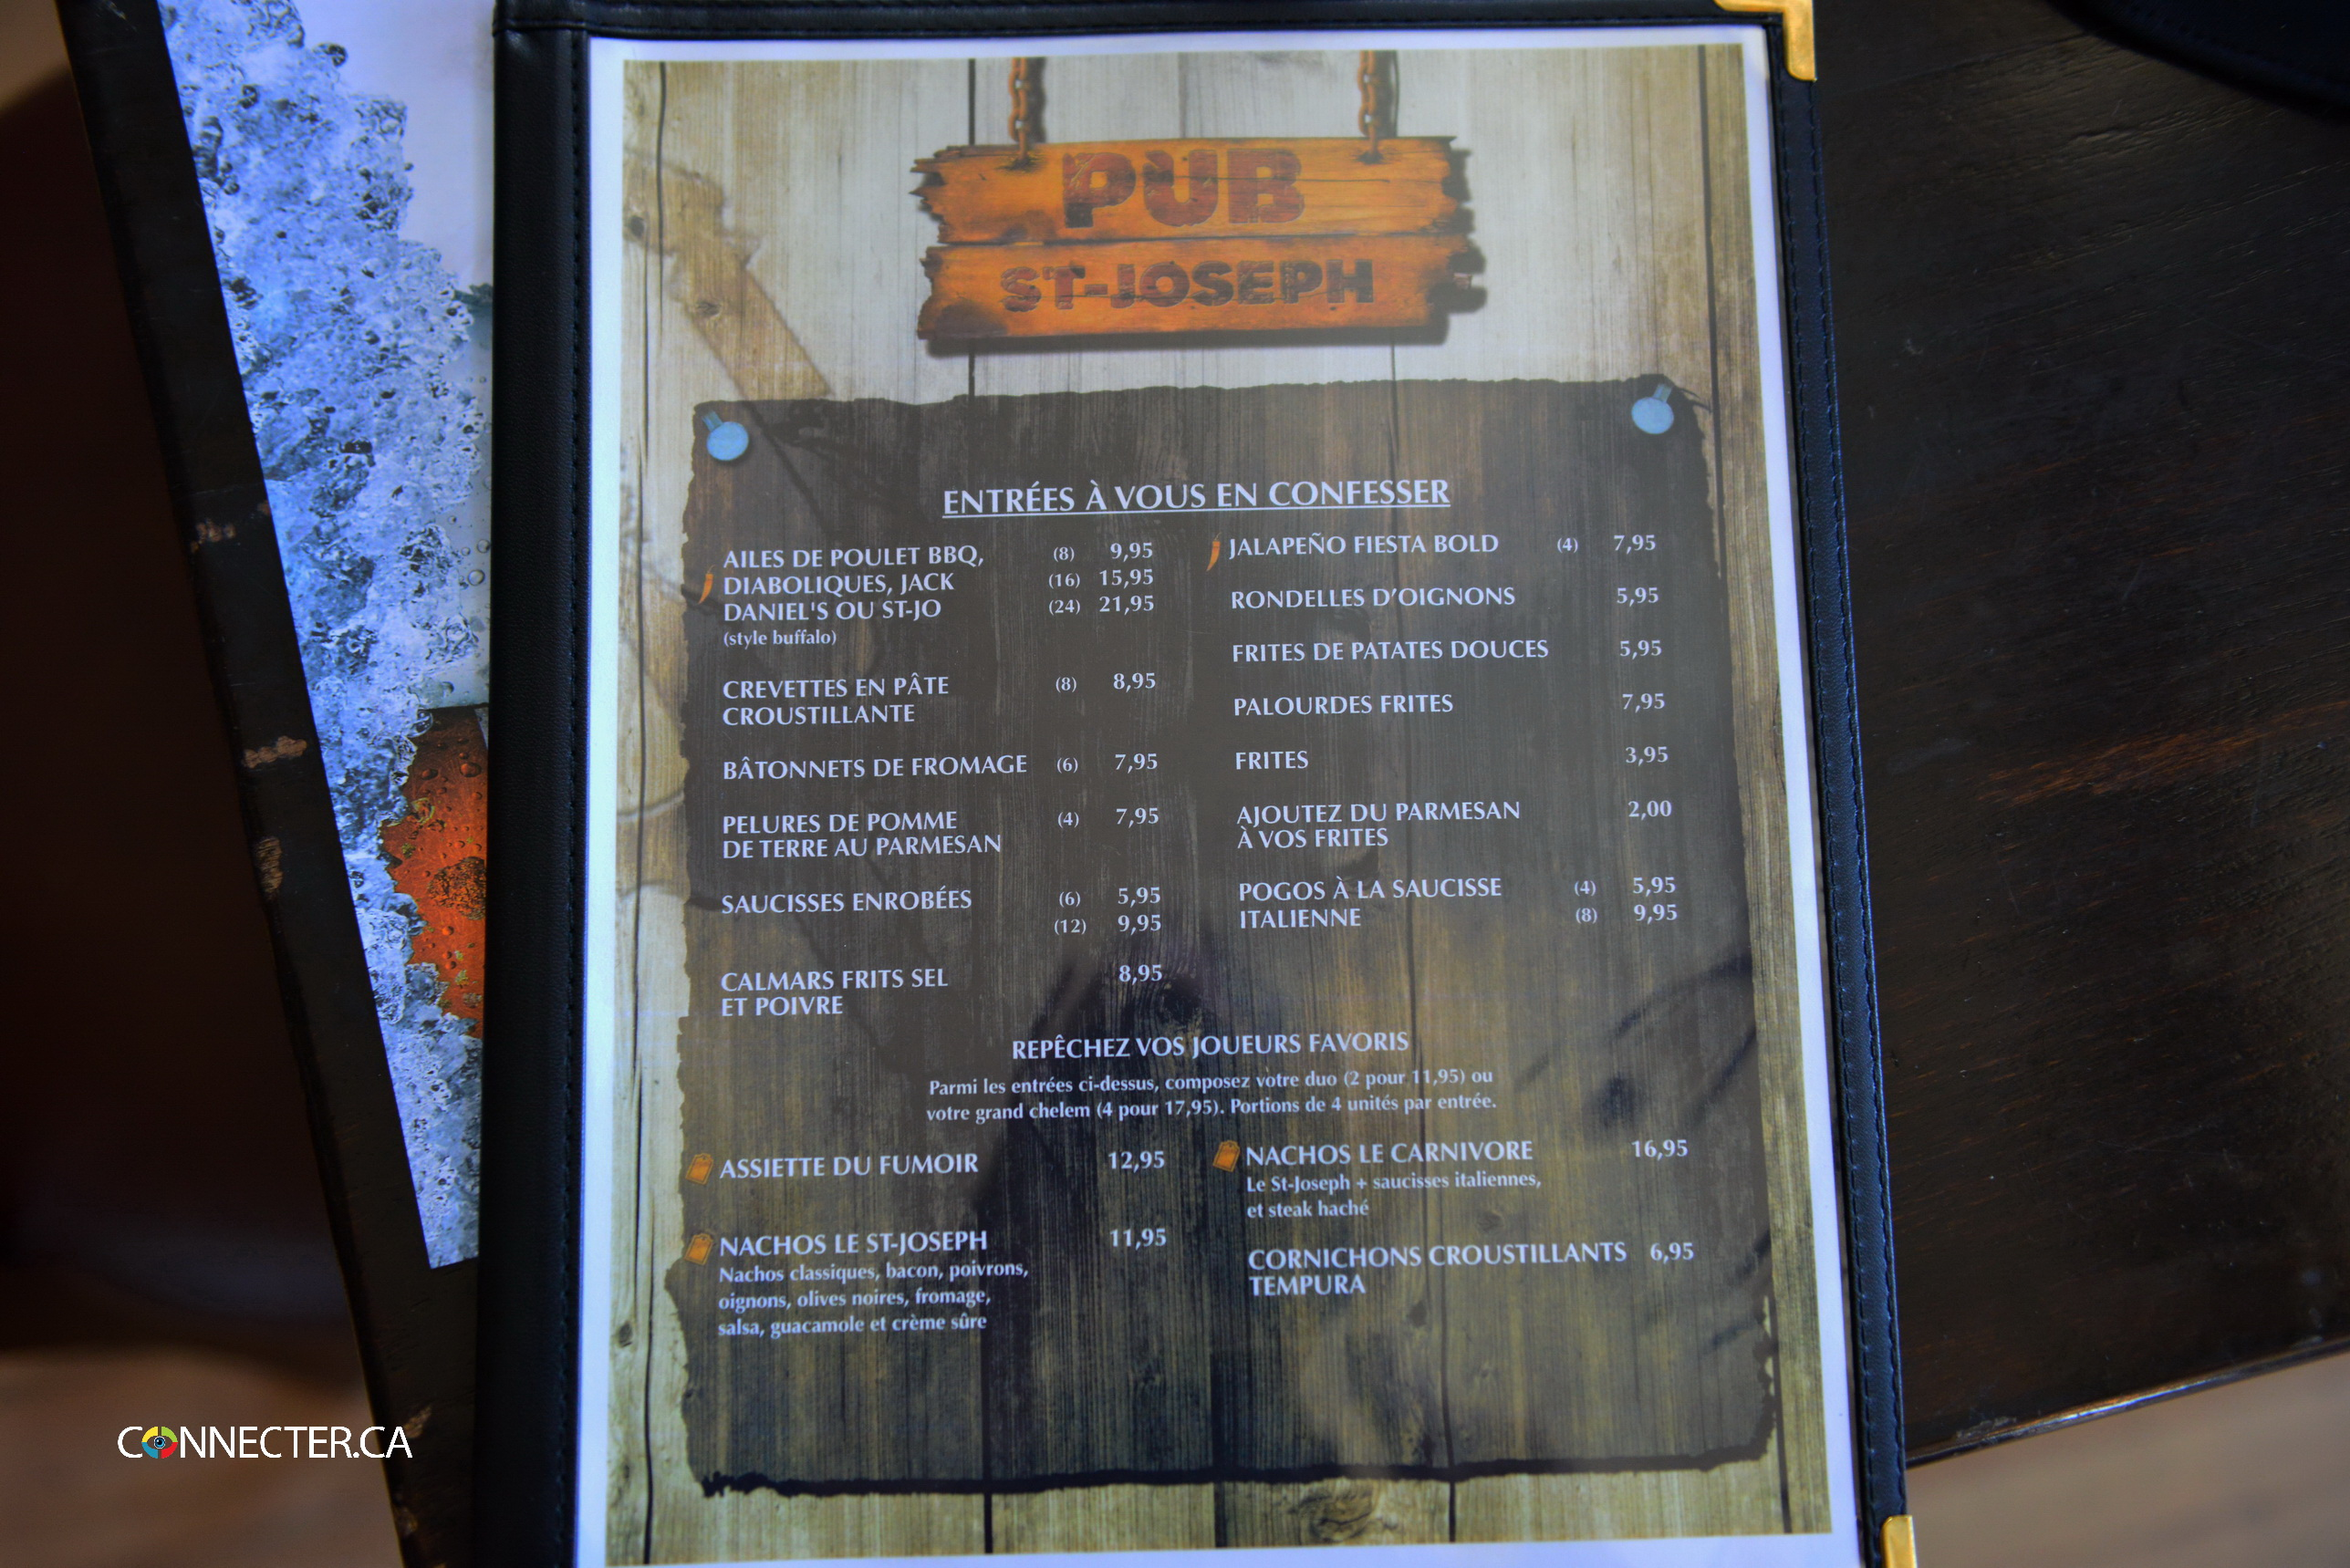 pub st-joseph bonaventure_14_redimensionner